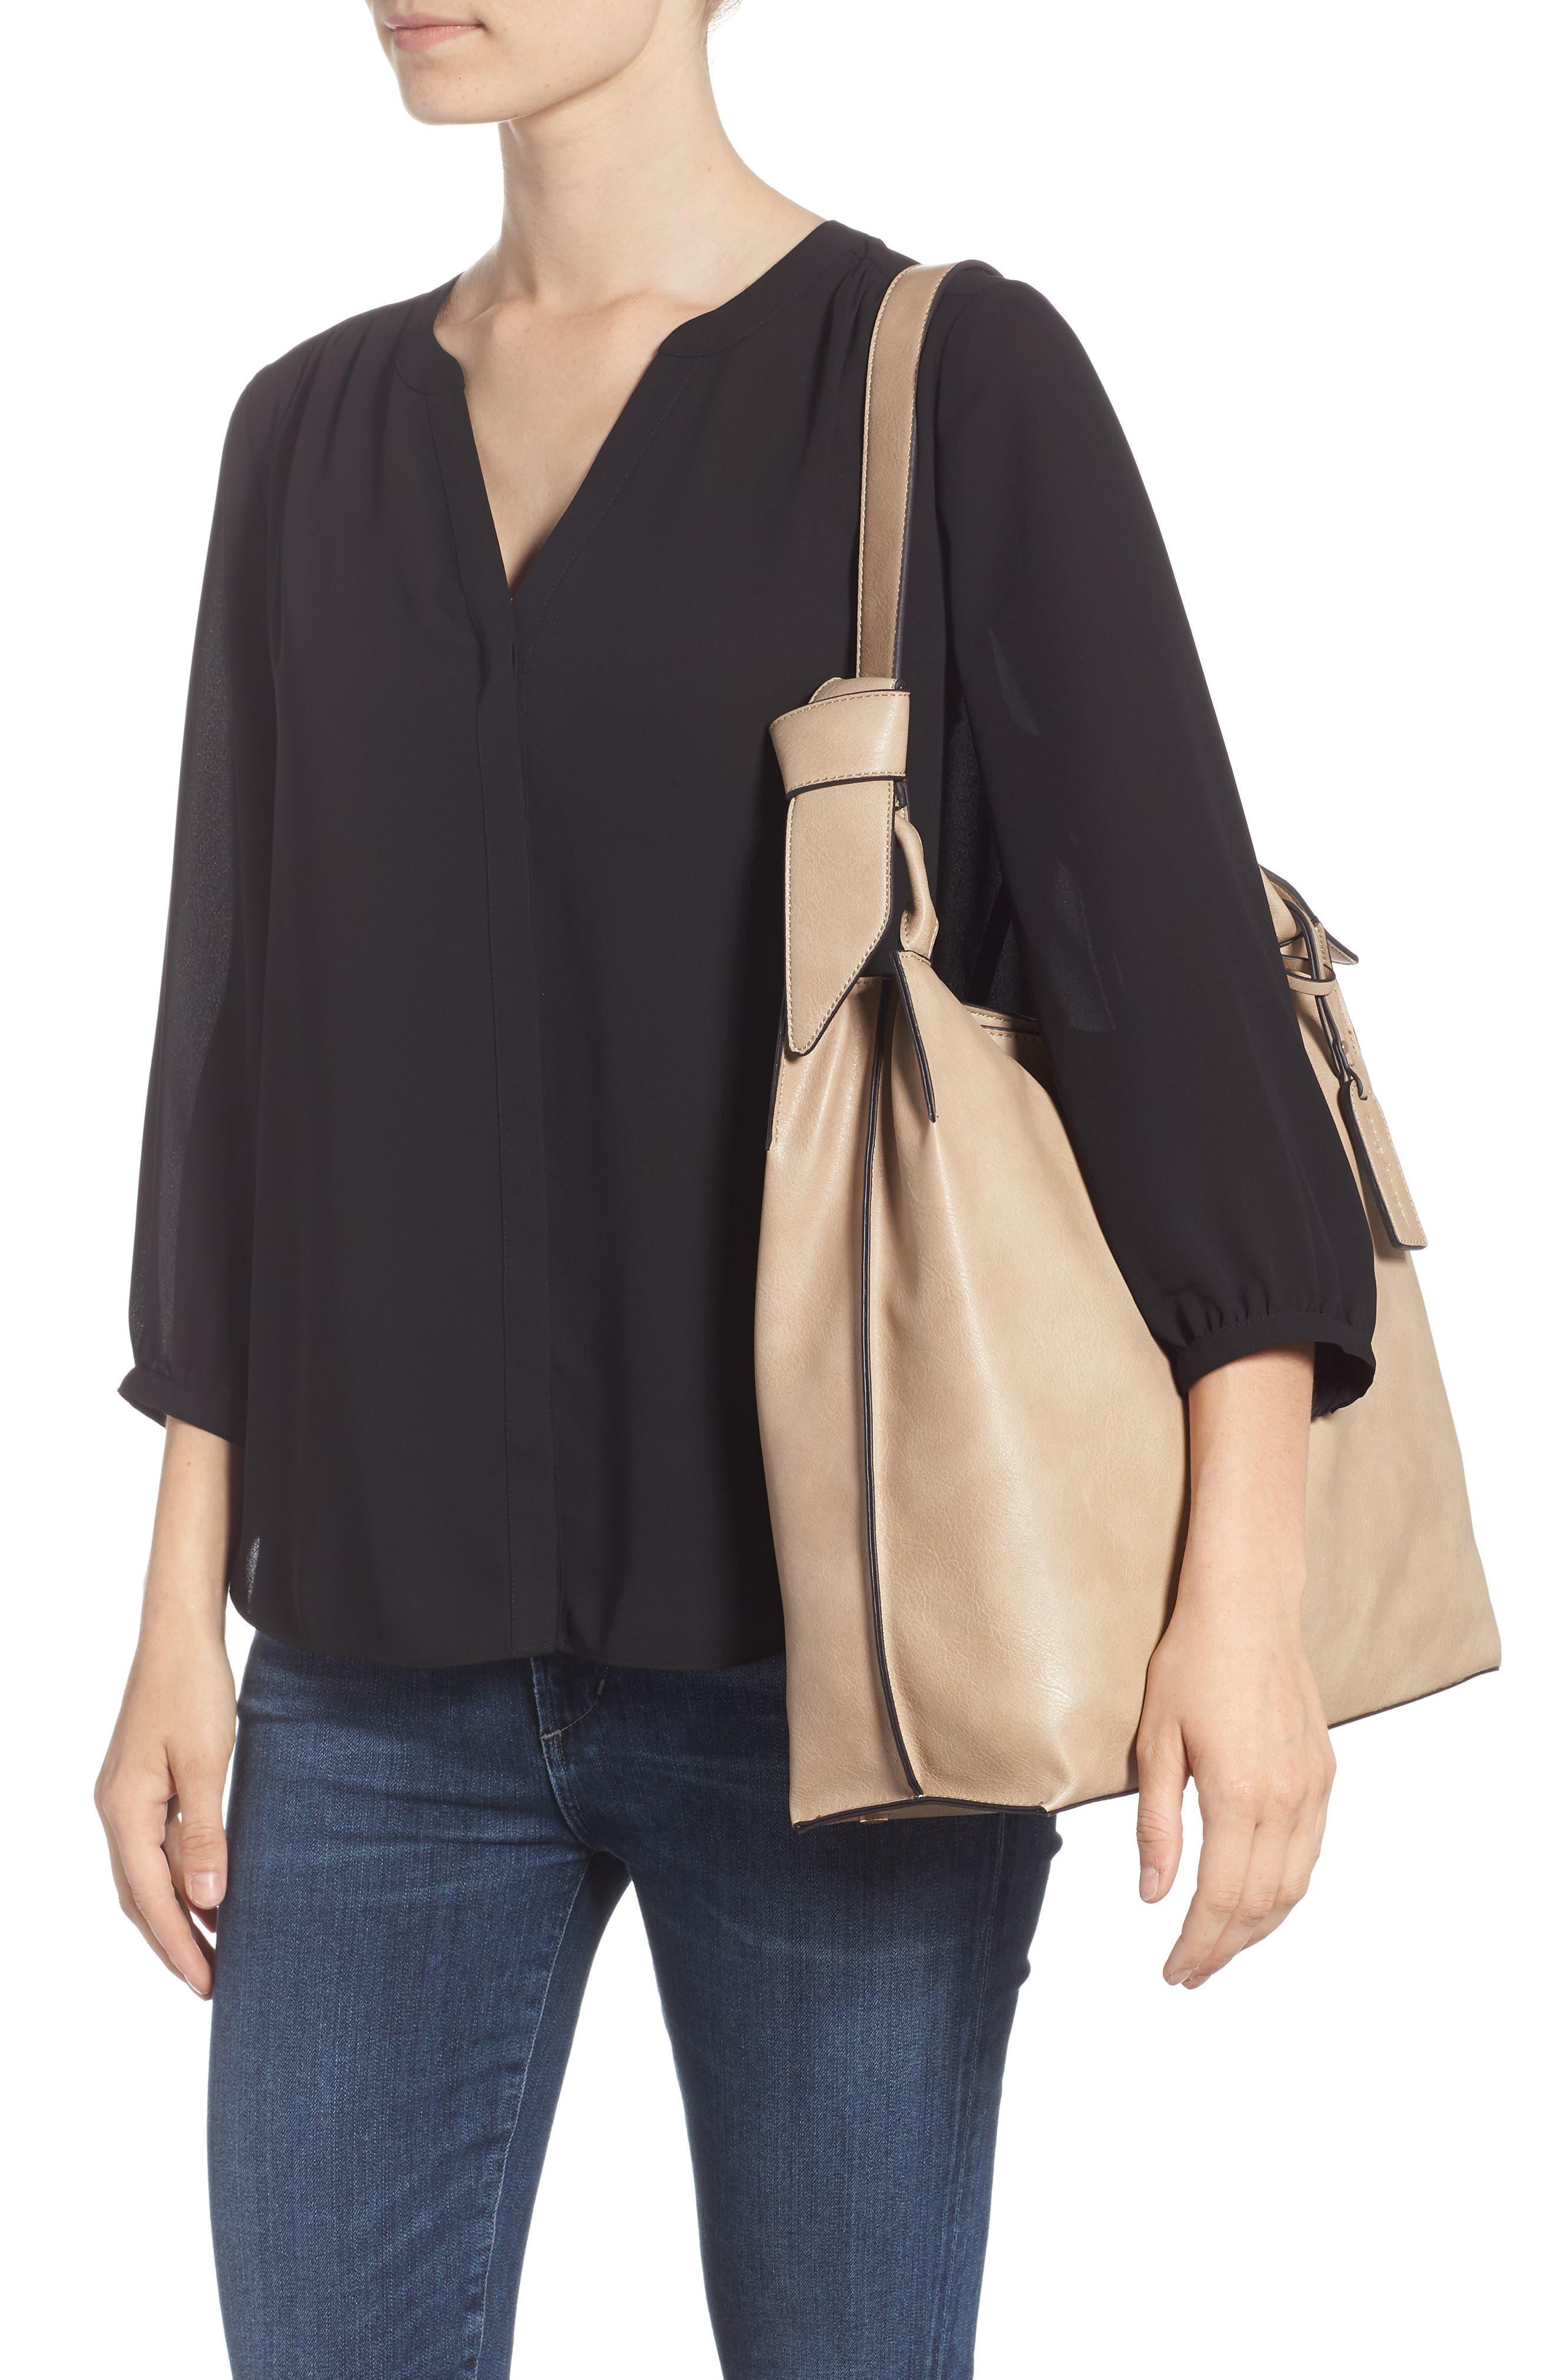 Josah Faux Leather Shoulder Bag,                             Alternate thumbnail 2, color,                             SAFARI